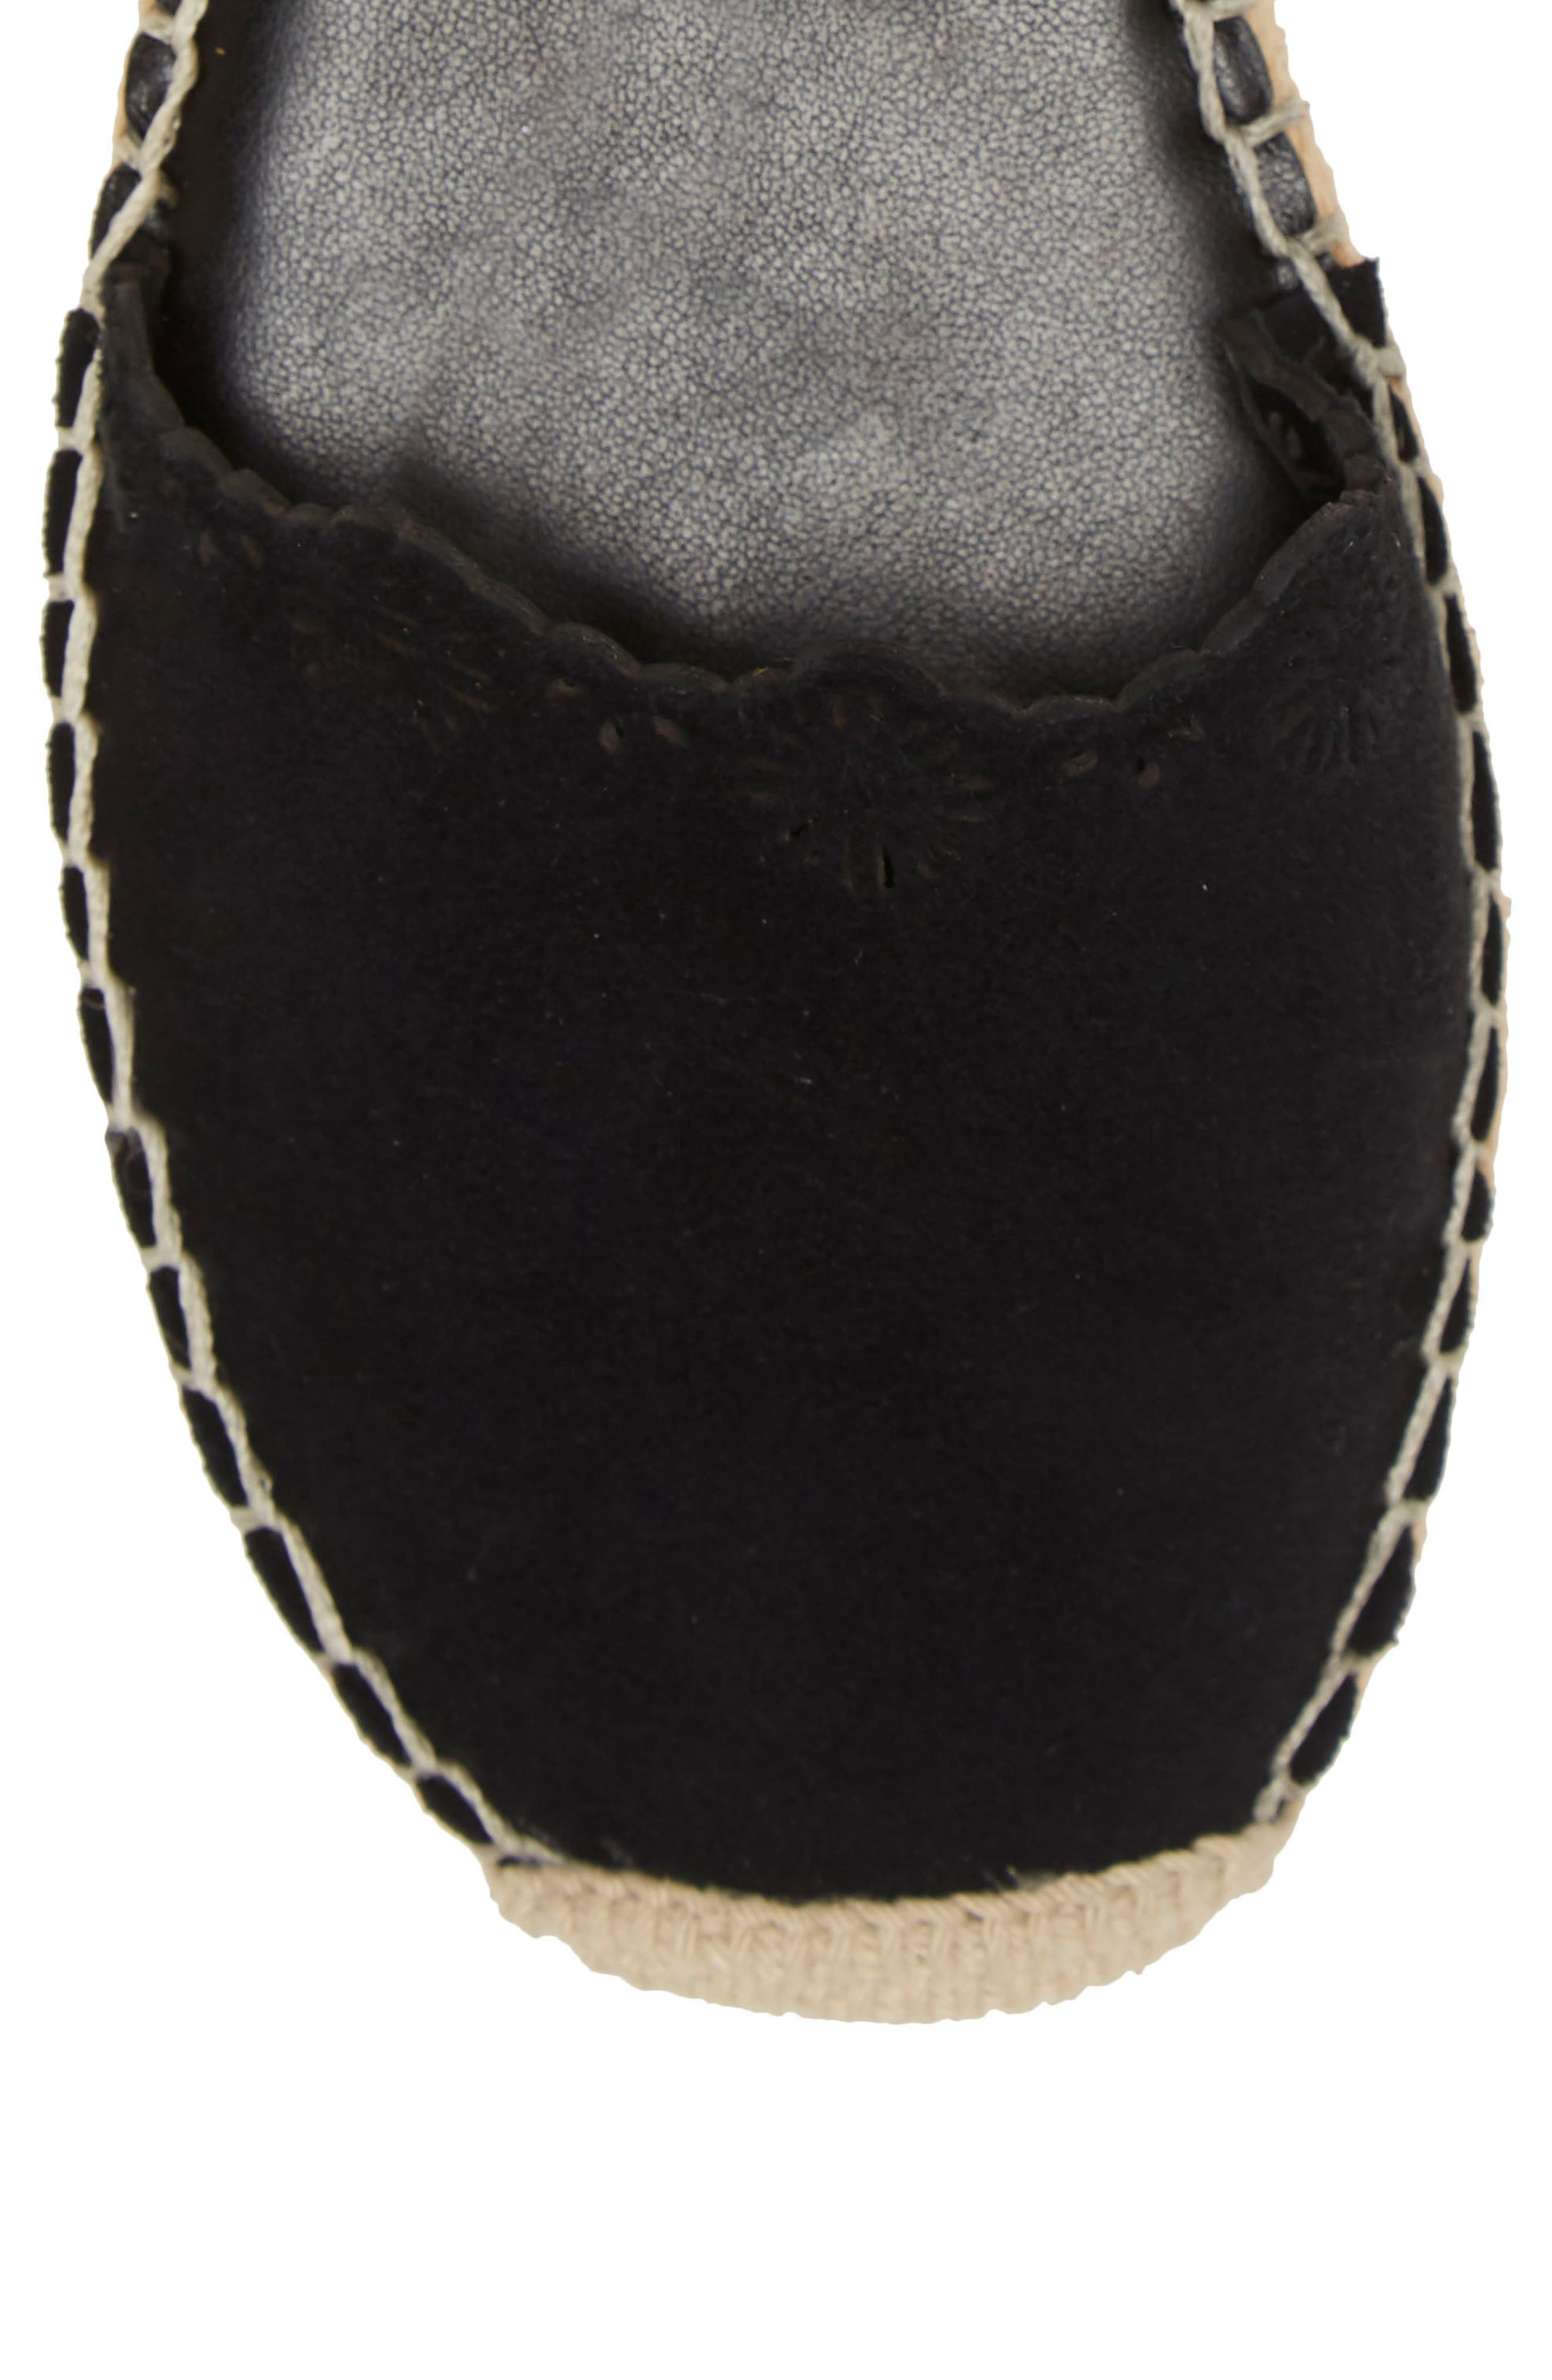 VINCE CAMUTO,                             Breshan Ankle Strap Espadrille Wedge,                             Alternate thumbnail 8, color,                             BLACK SUEDE